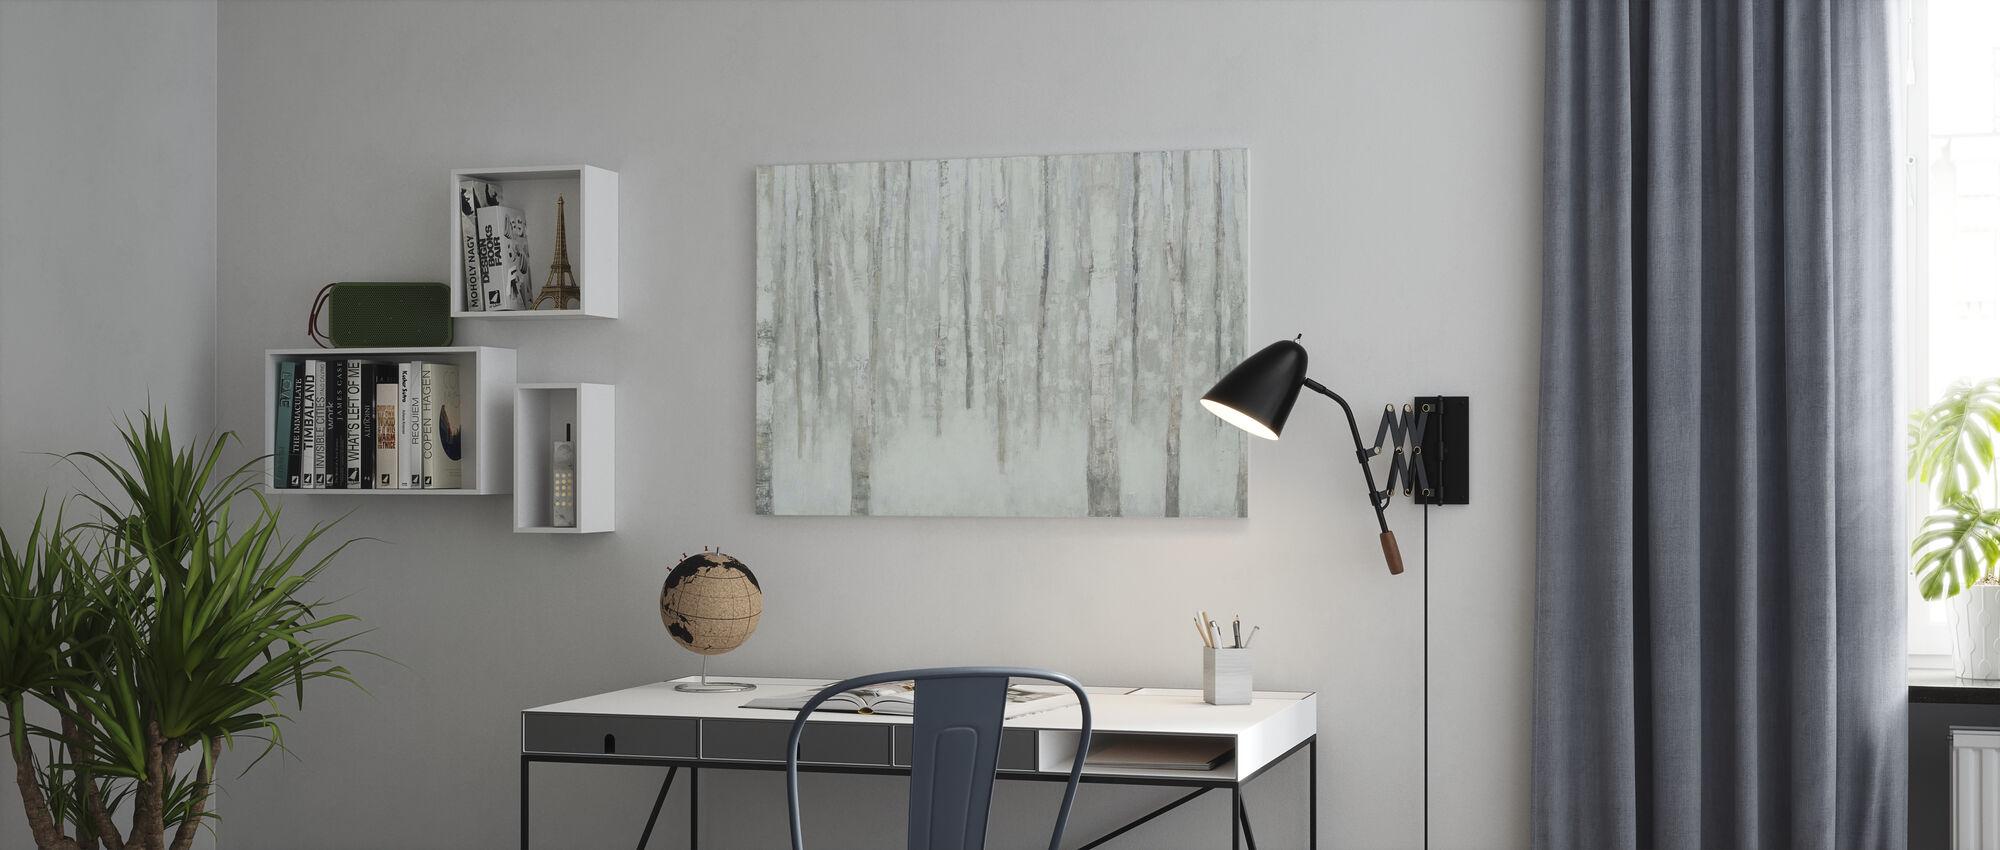 Birches in Winter - Canvas print - Office